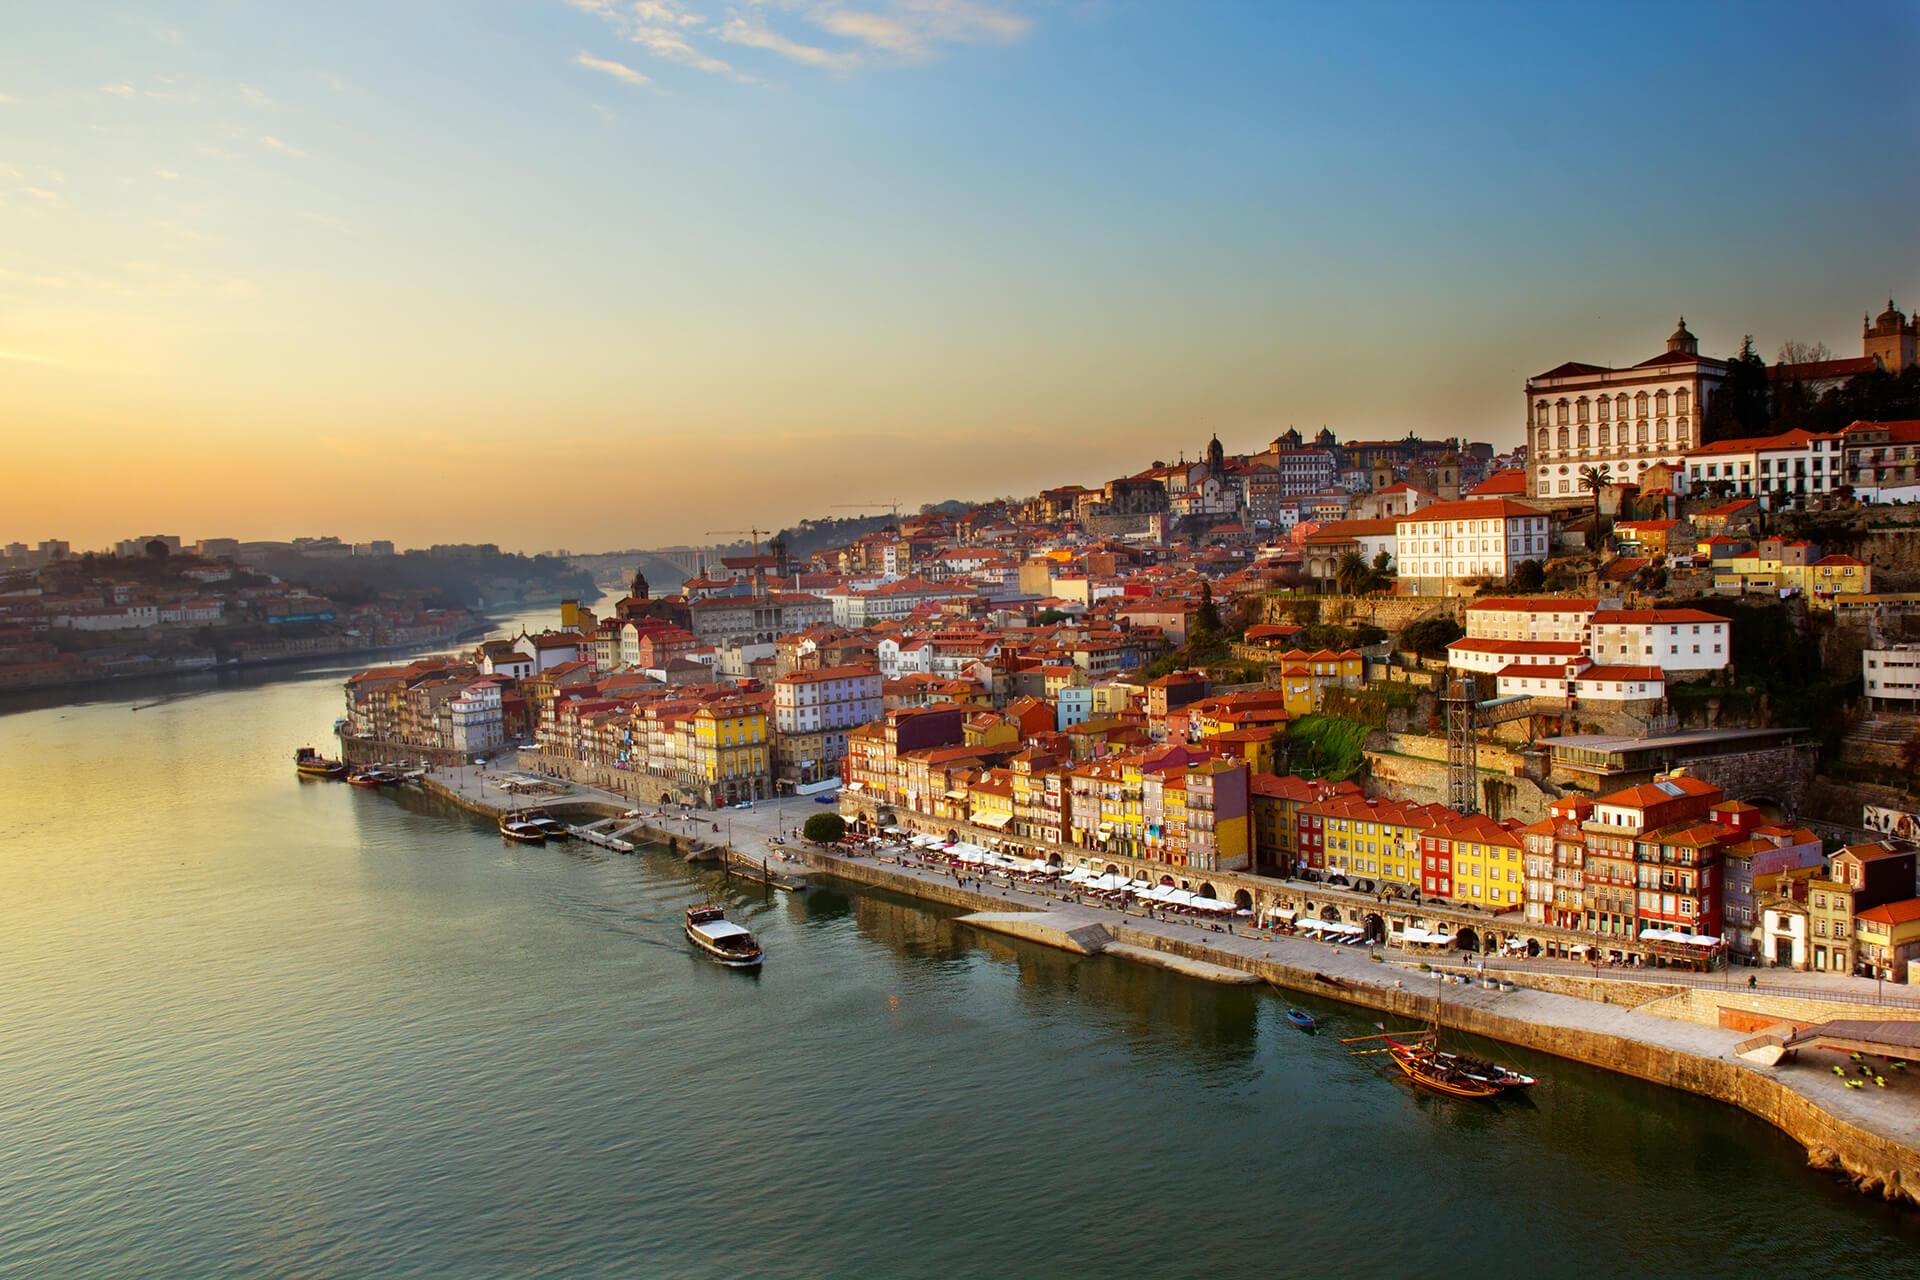 Douro and Oporto